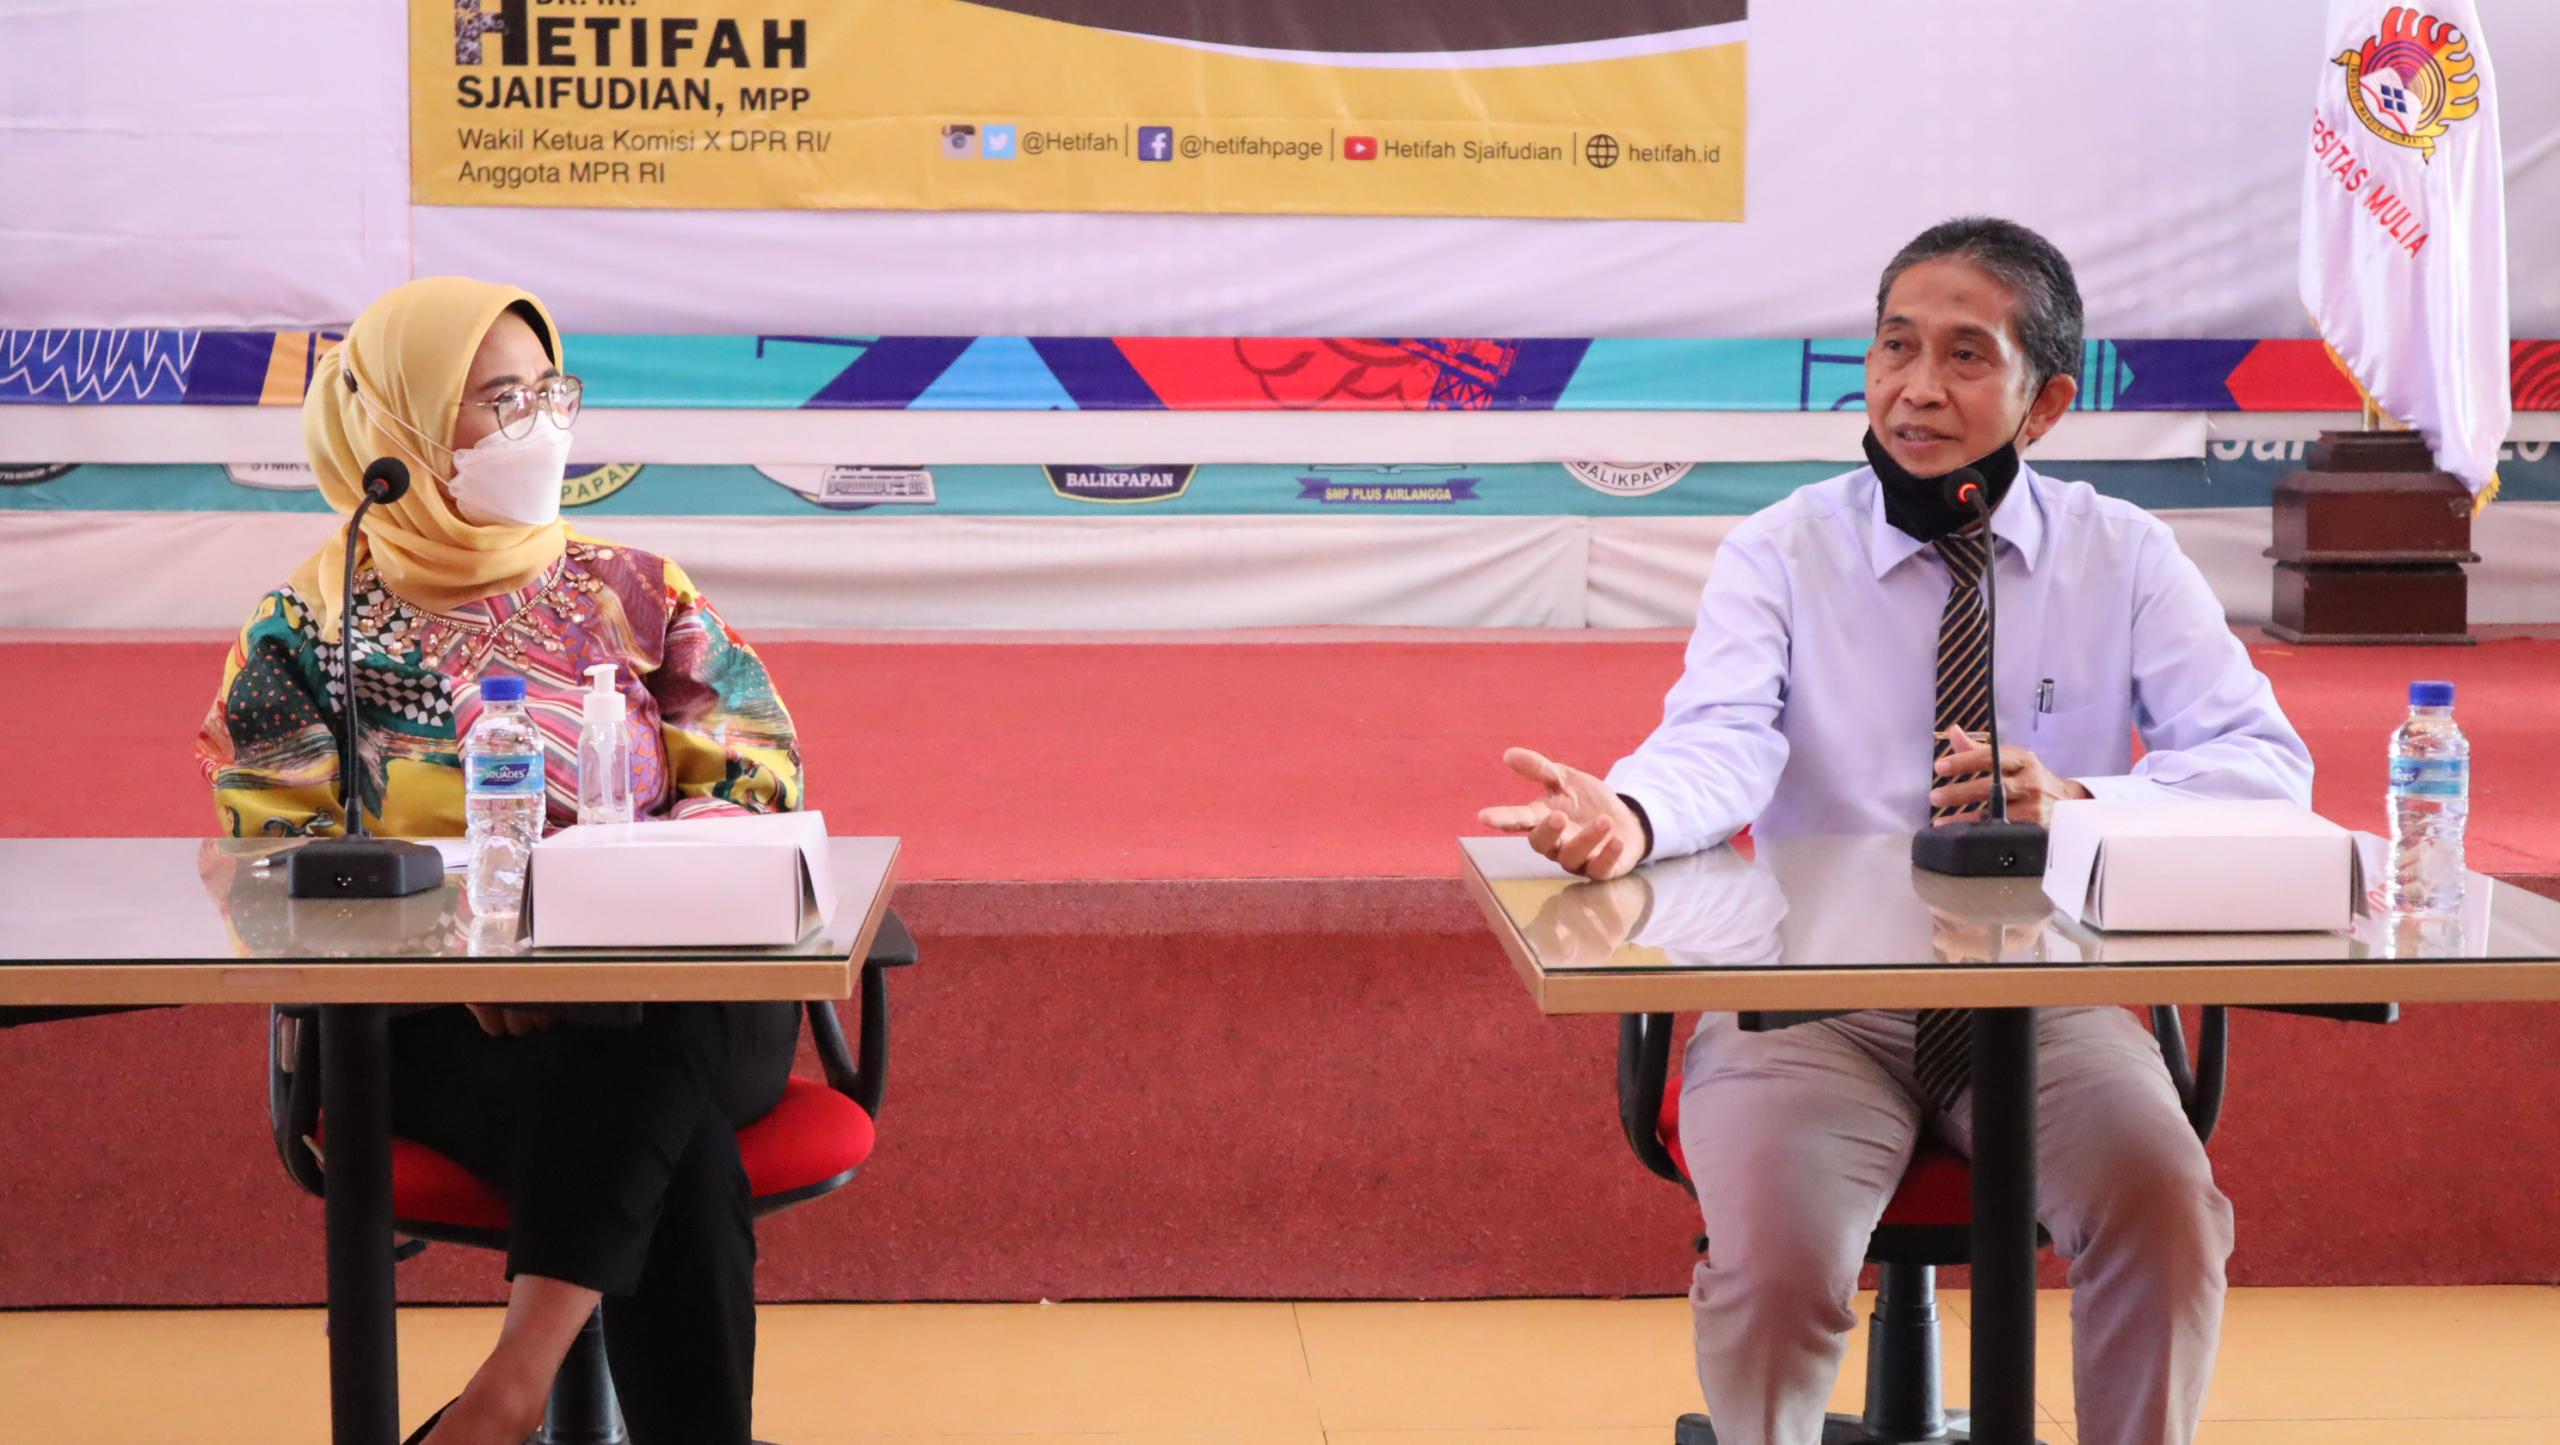 Dr. Ir. Hetifah Sjaifudian, MPP bersama Rektor Universitas Mulia Dr. Agung Sakti Pribadi, S.H., M.H.